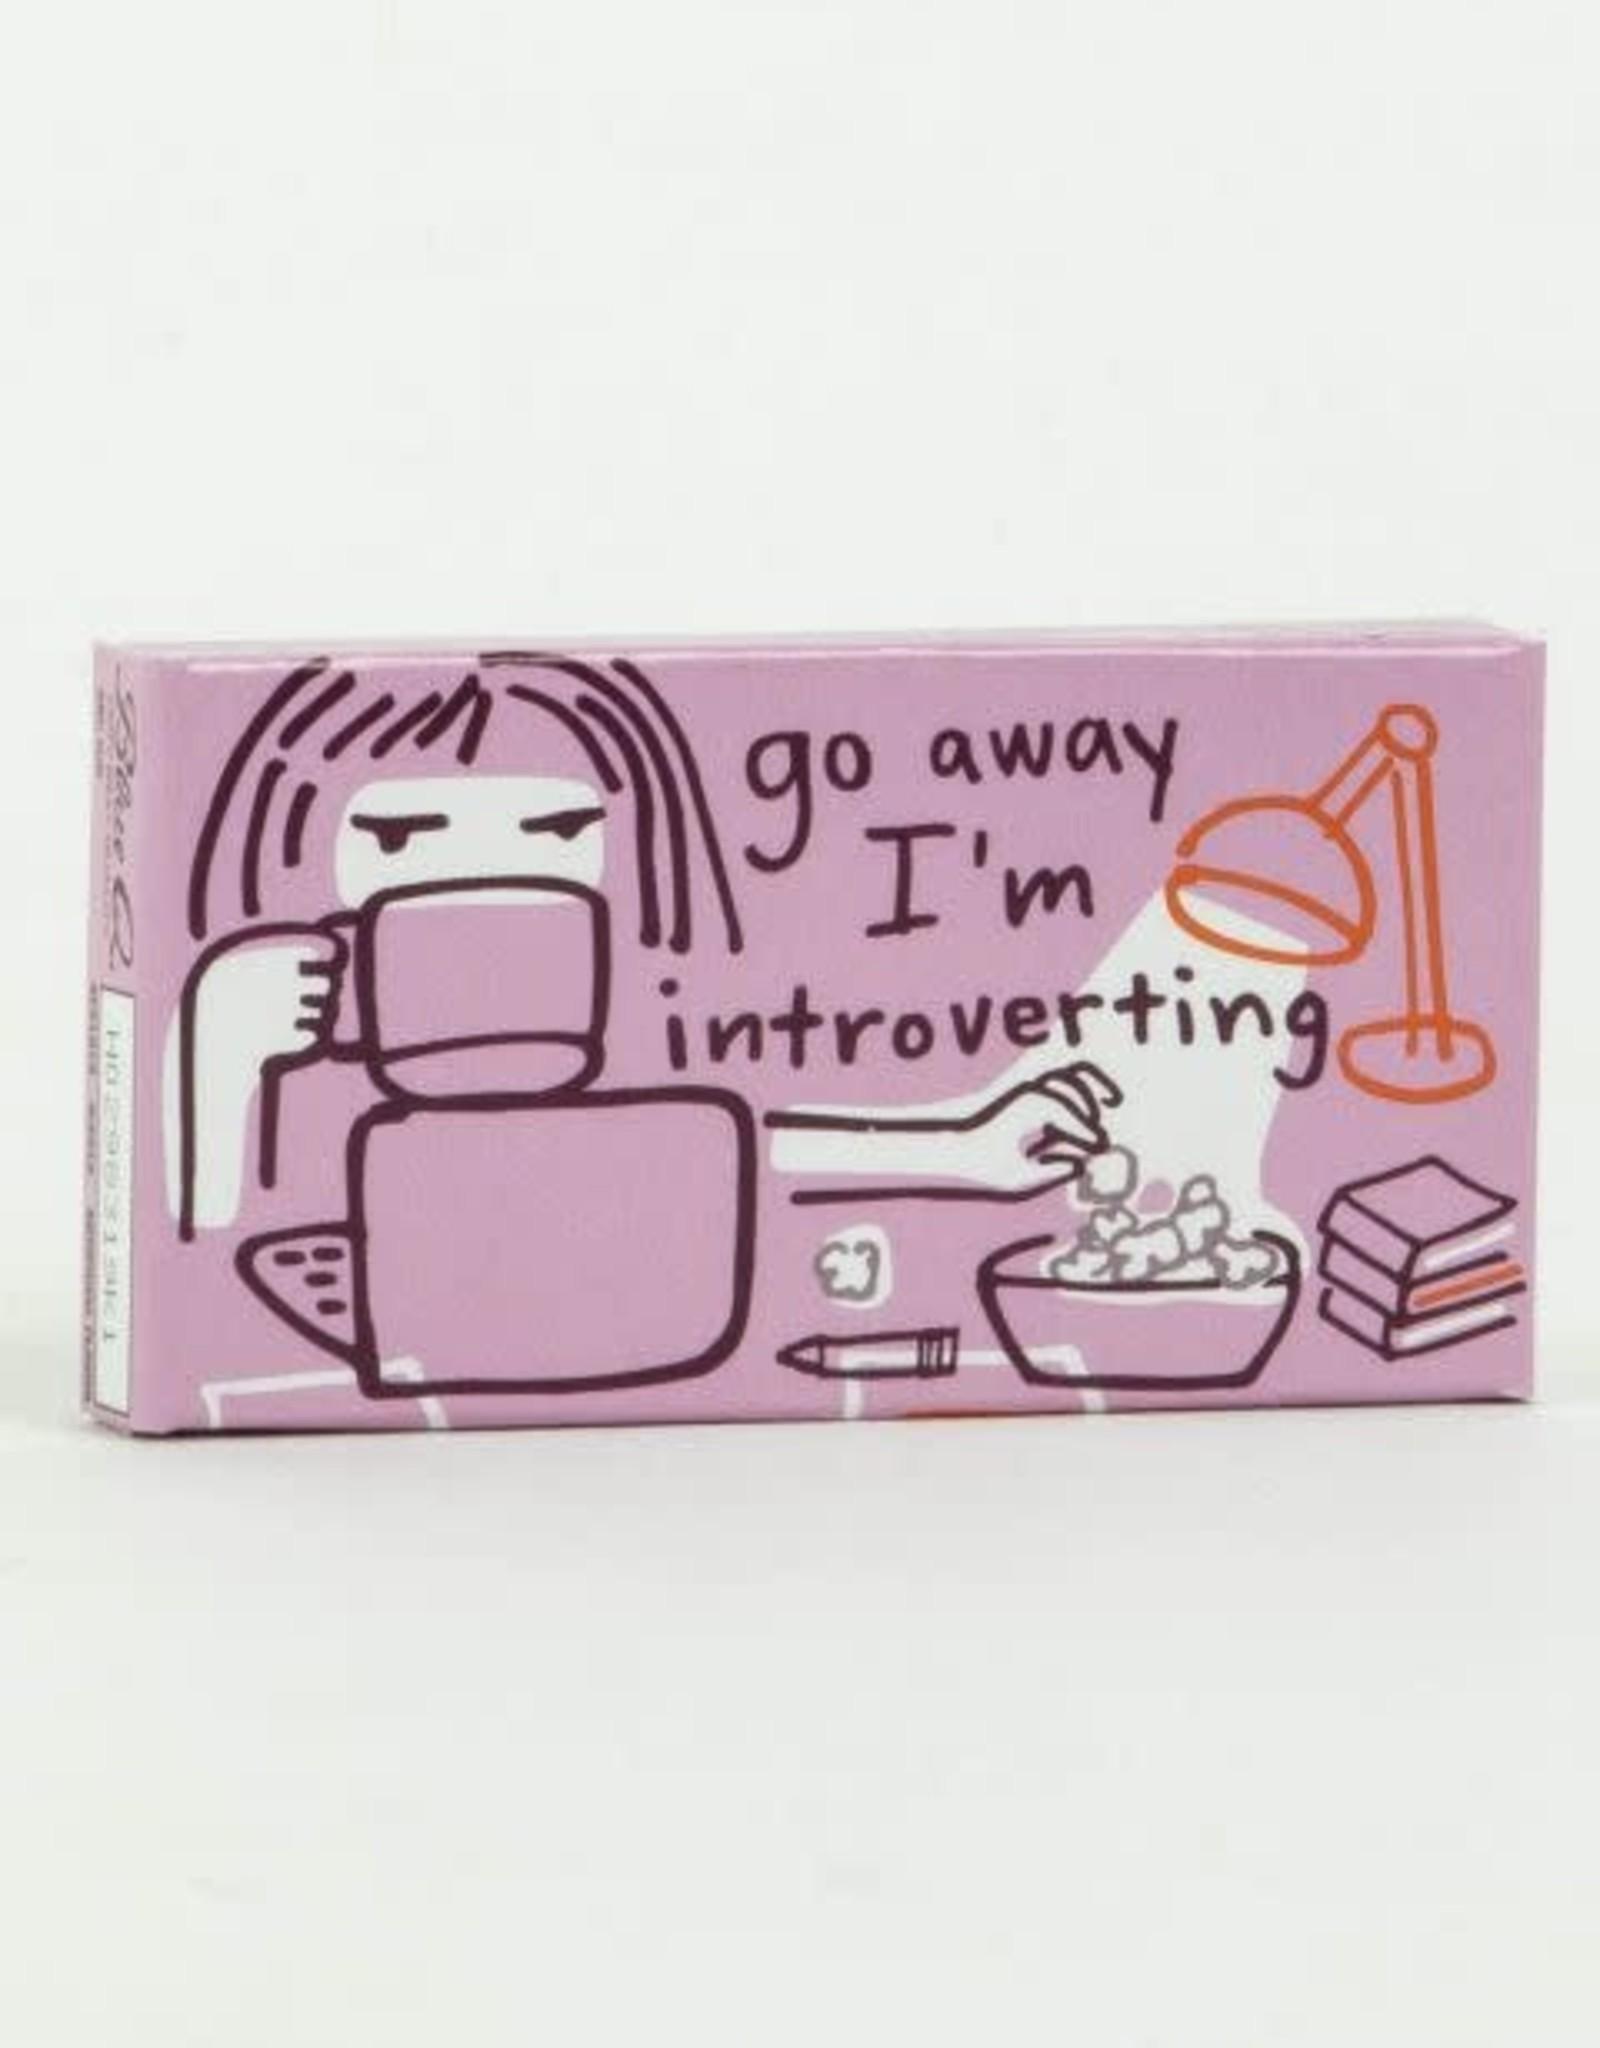 Blue Q Gum Go Away I'm Introverting